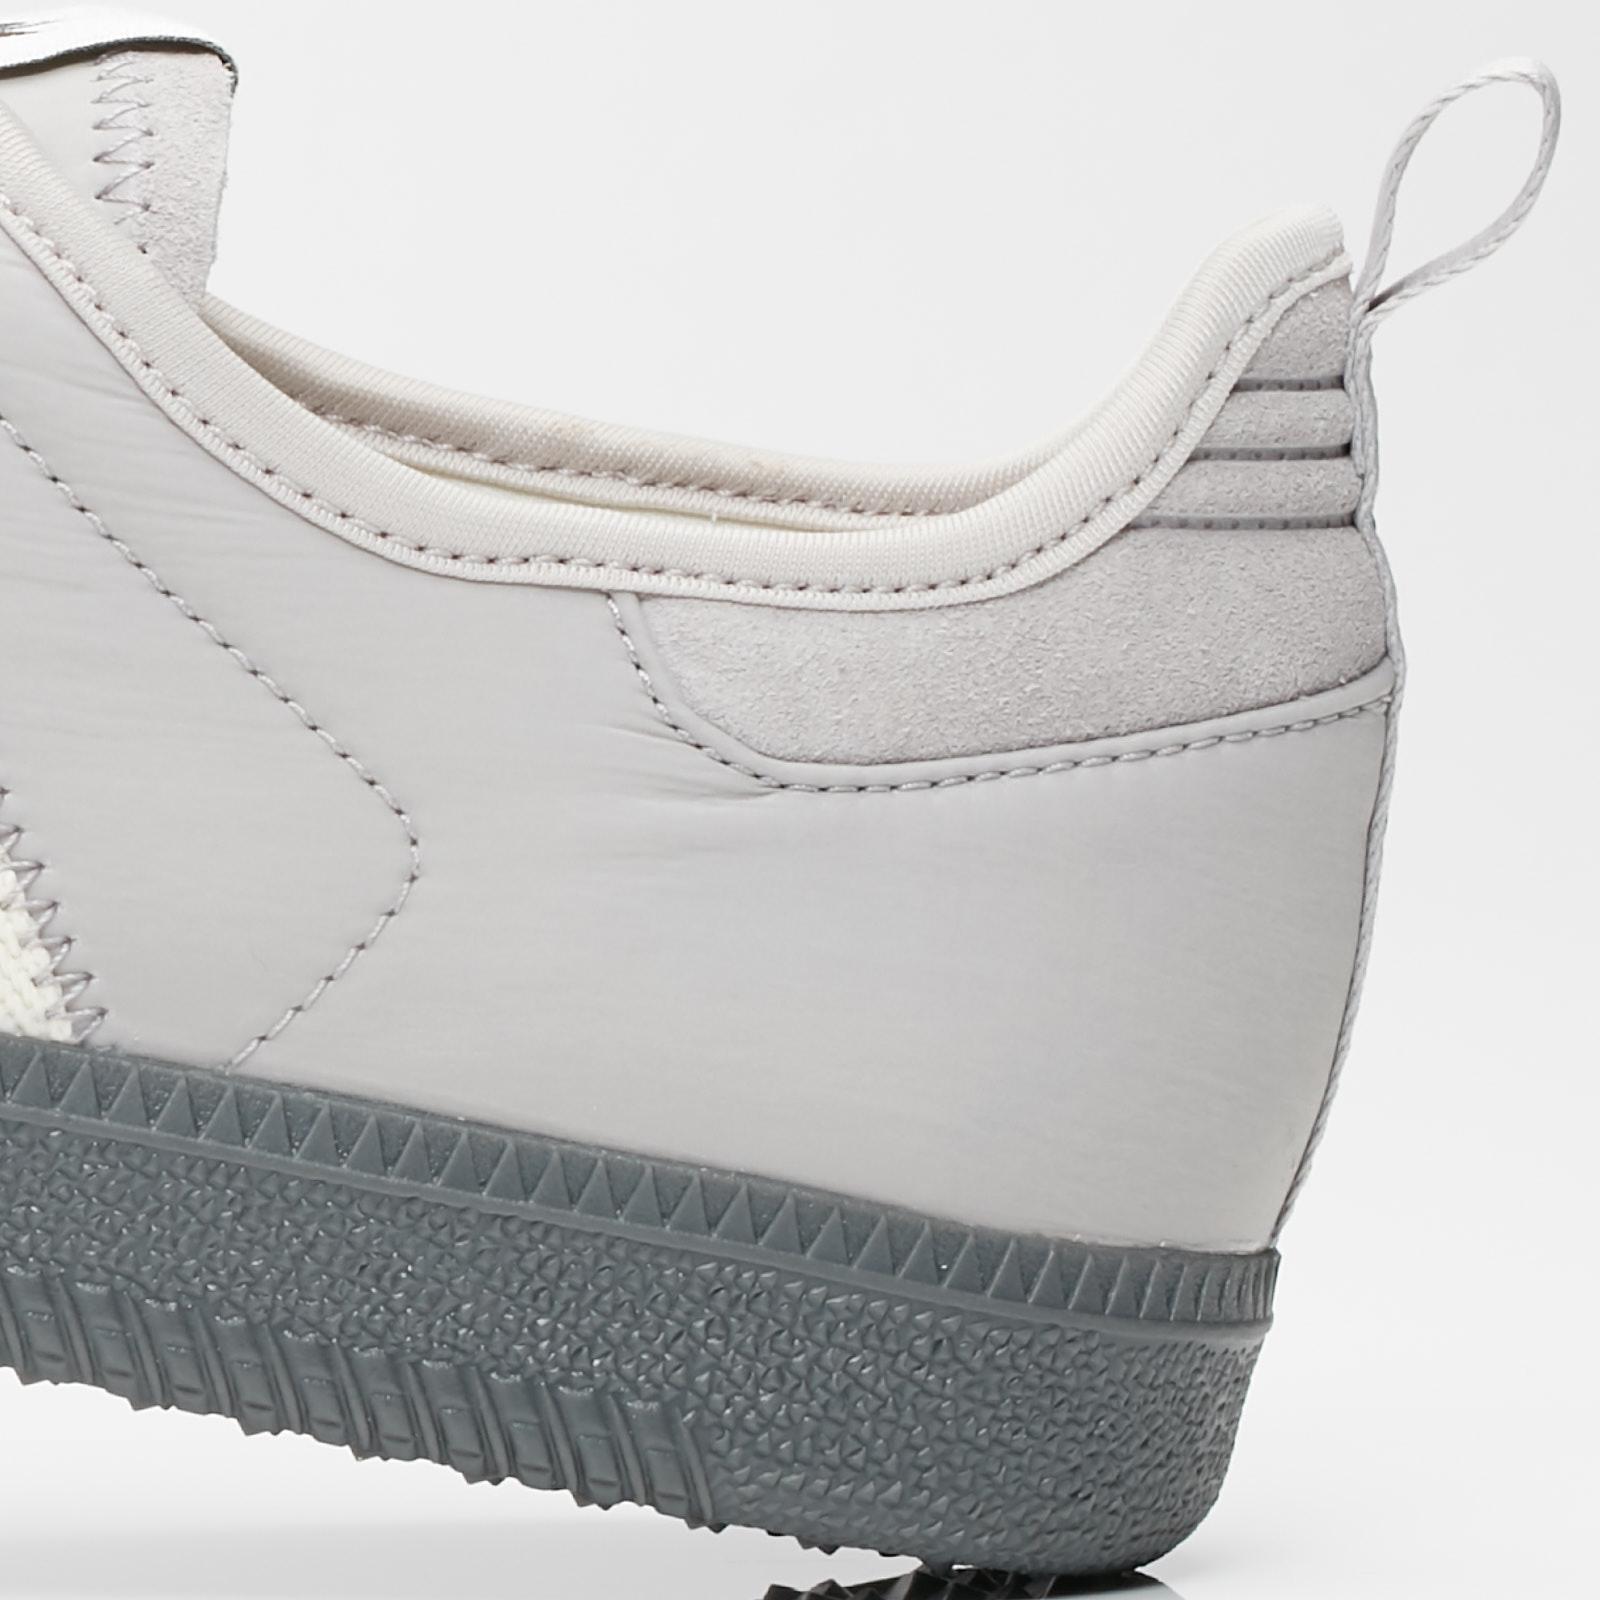 amargo Residente Inspección  adidas Samba x C.P. Company - F33870 - Sneakersnstuff | sneakers &  streetwear online since 1999